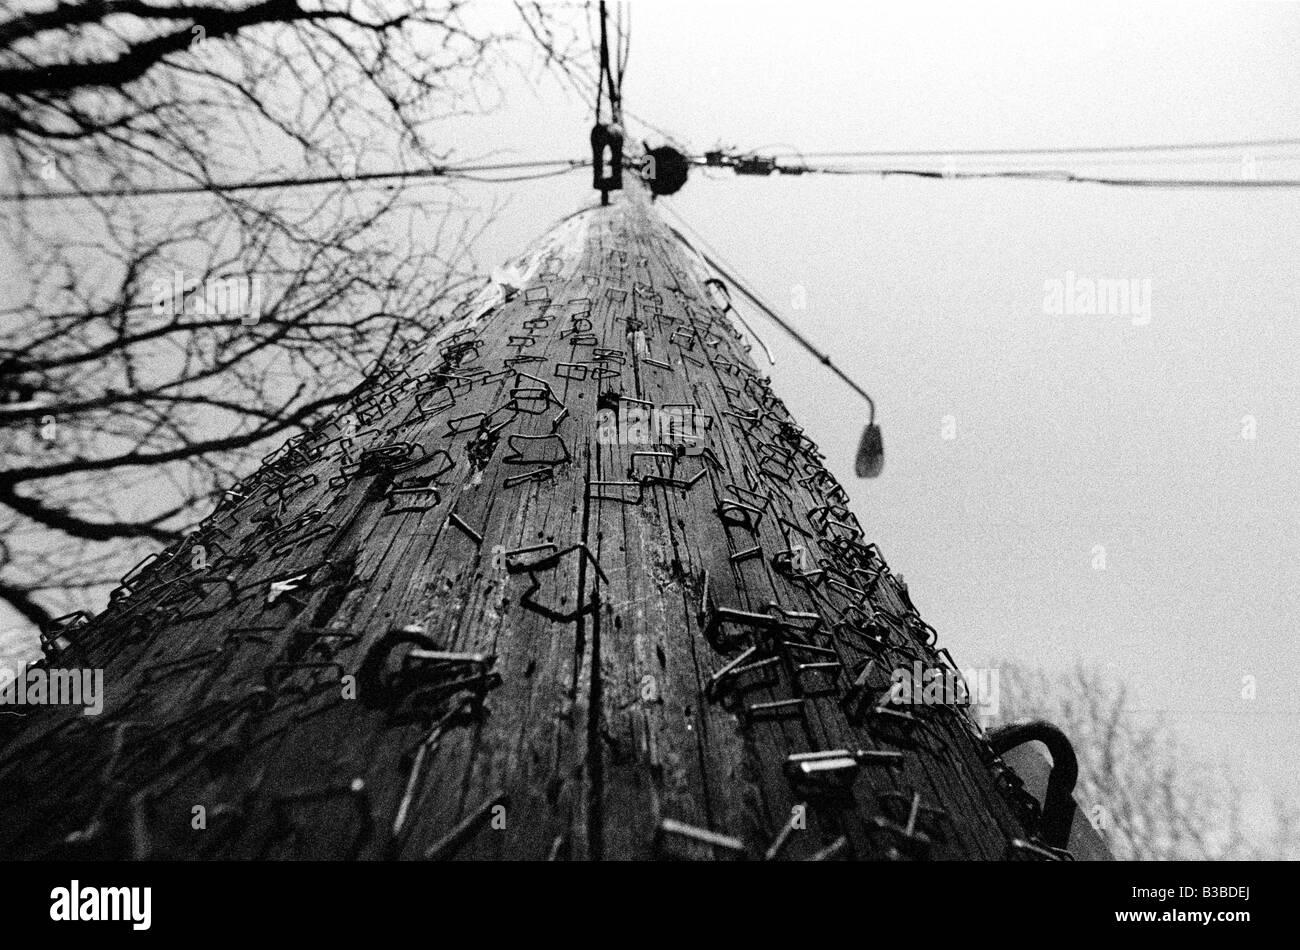 Photo of a light pole/telephone pole - Stock Image